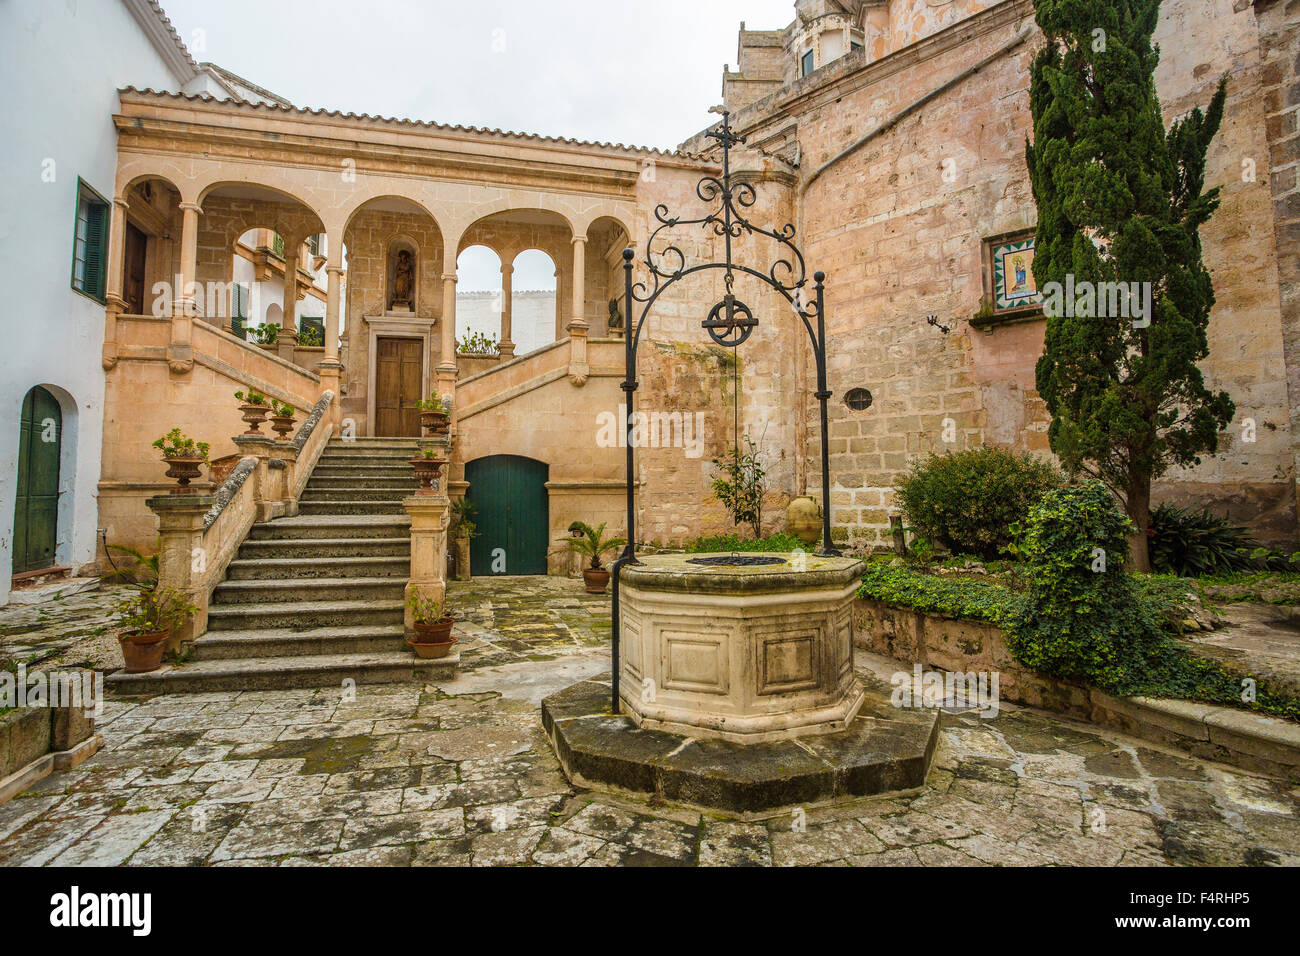 Ciutadella, Stadt, Menorca, Insel, Palast, Spanien, Europa, Balearen, Frühling, Architektur, Bischofspalast, Stockbild